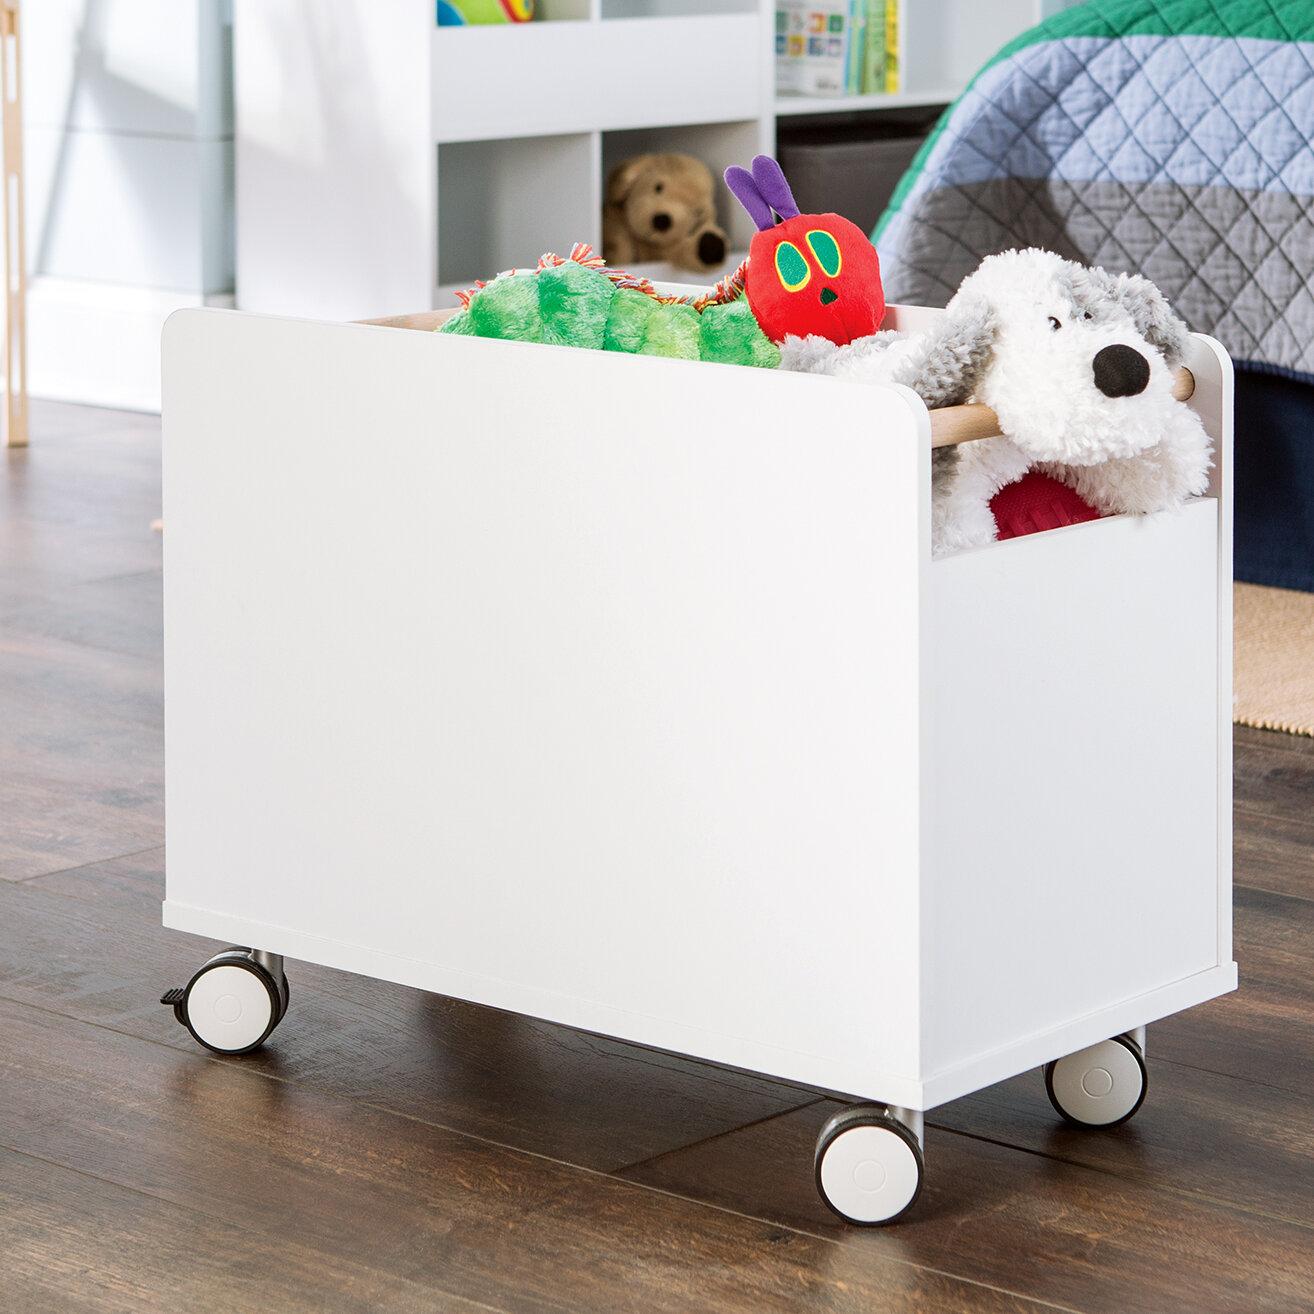 ClosetMaid KidSpace Toy Box & Reviews | Wayfair